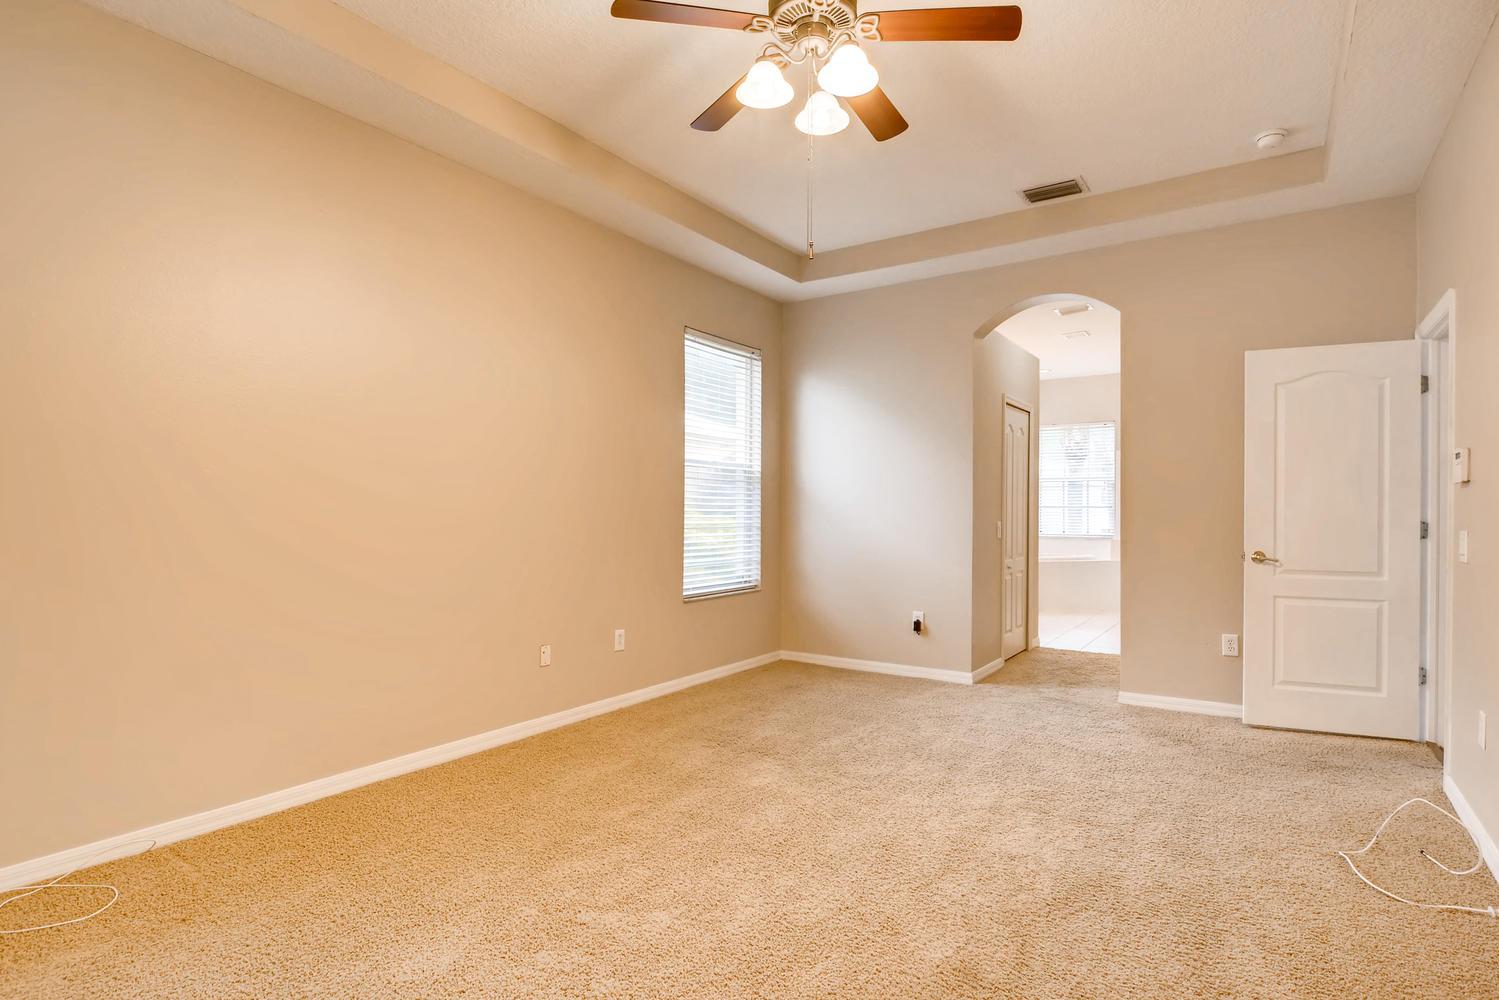 Photo of 4320 Balington Drive, Valrico, FL, 33596